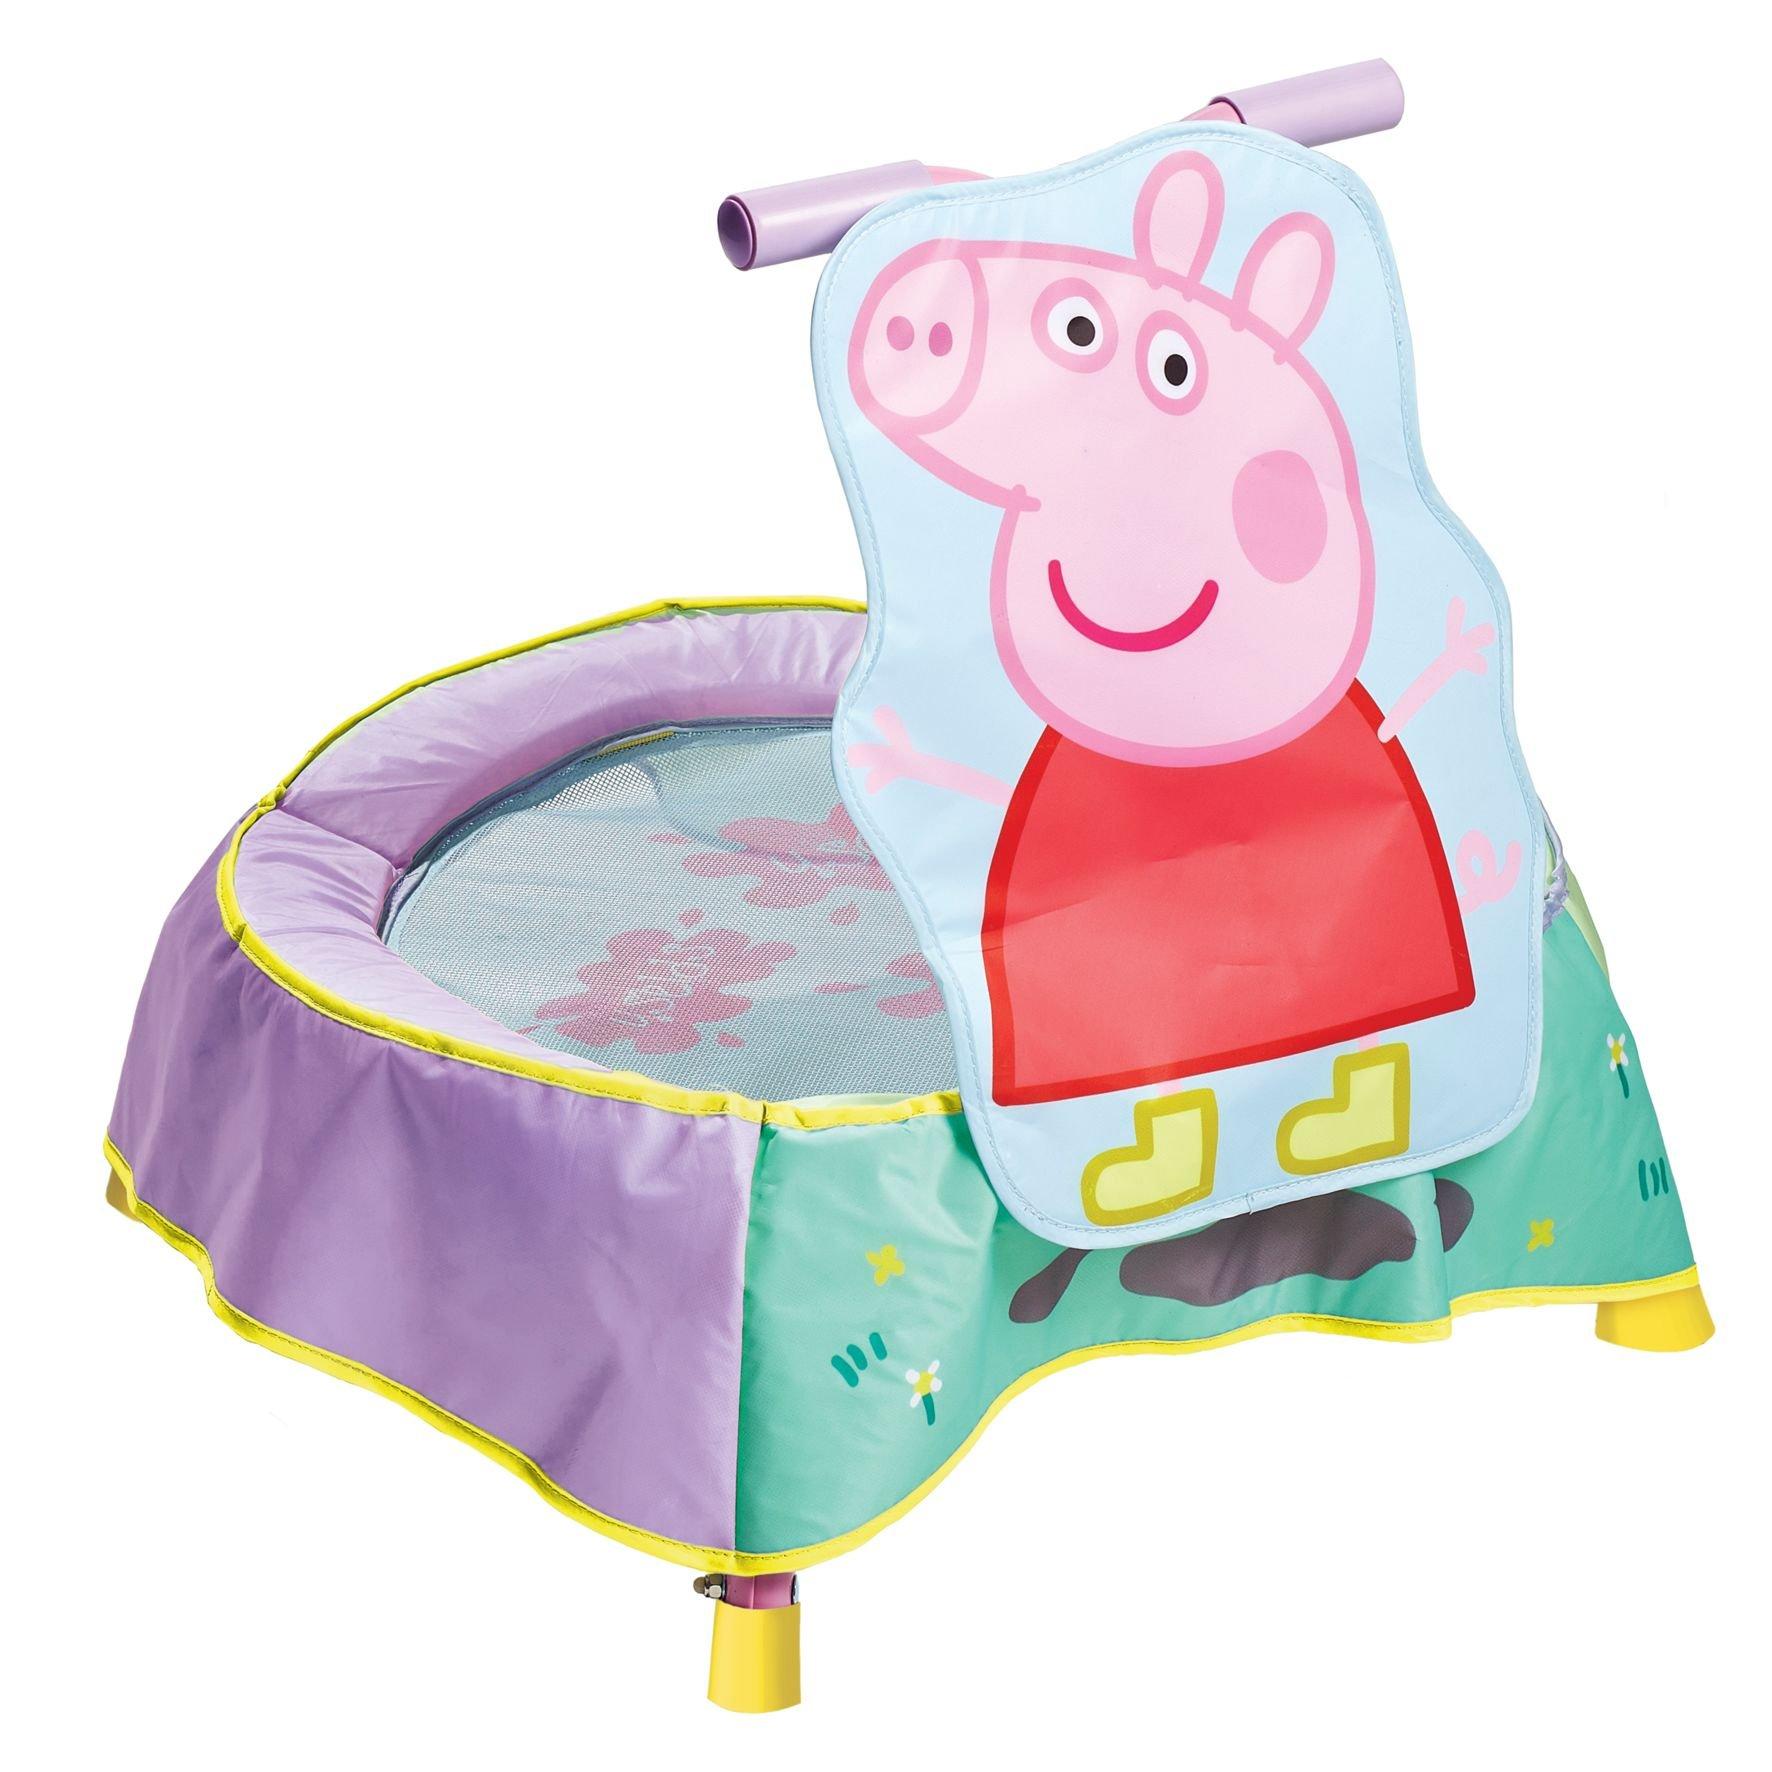 KidActive Peppa Pig Indoor Childrens Toddler Trampoline